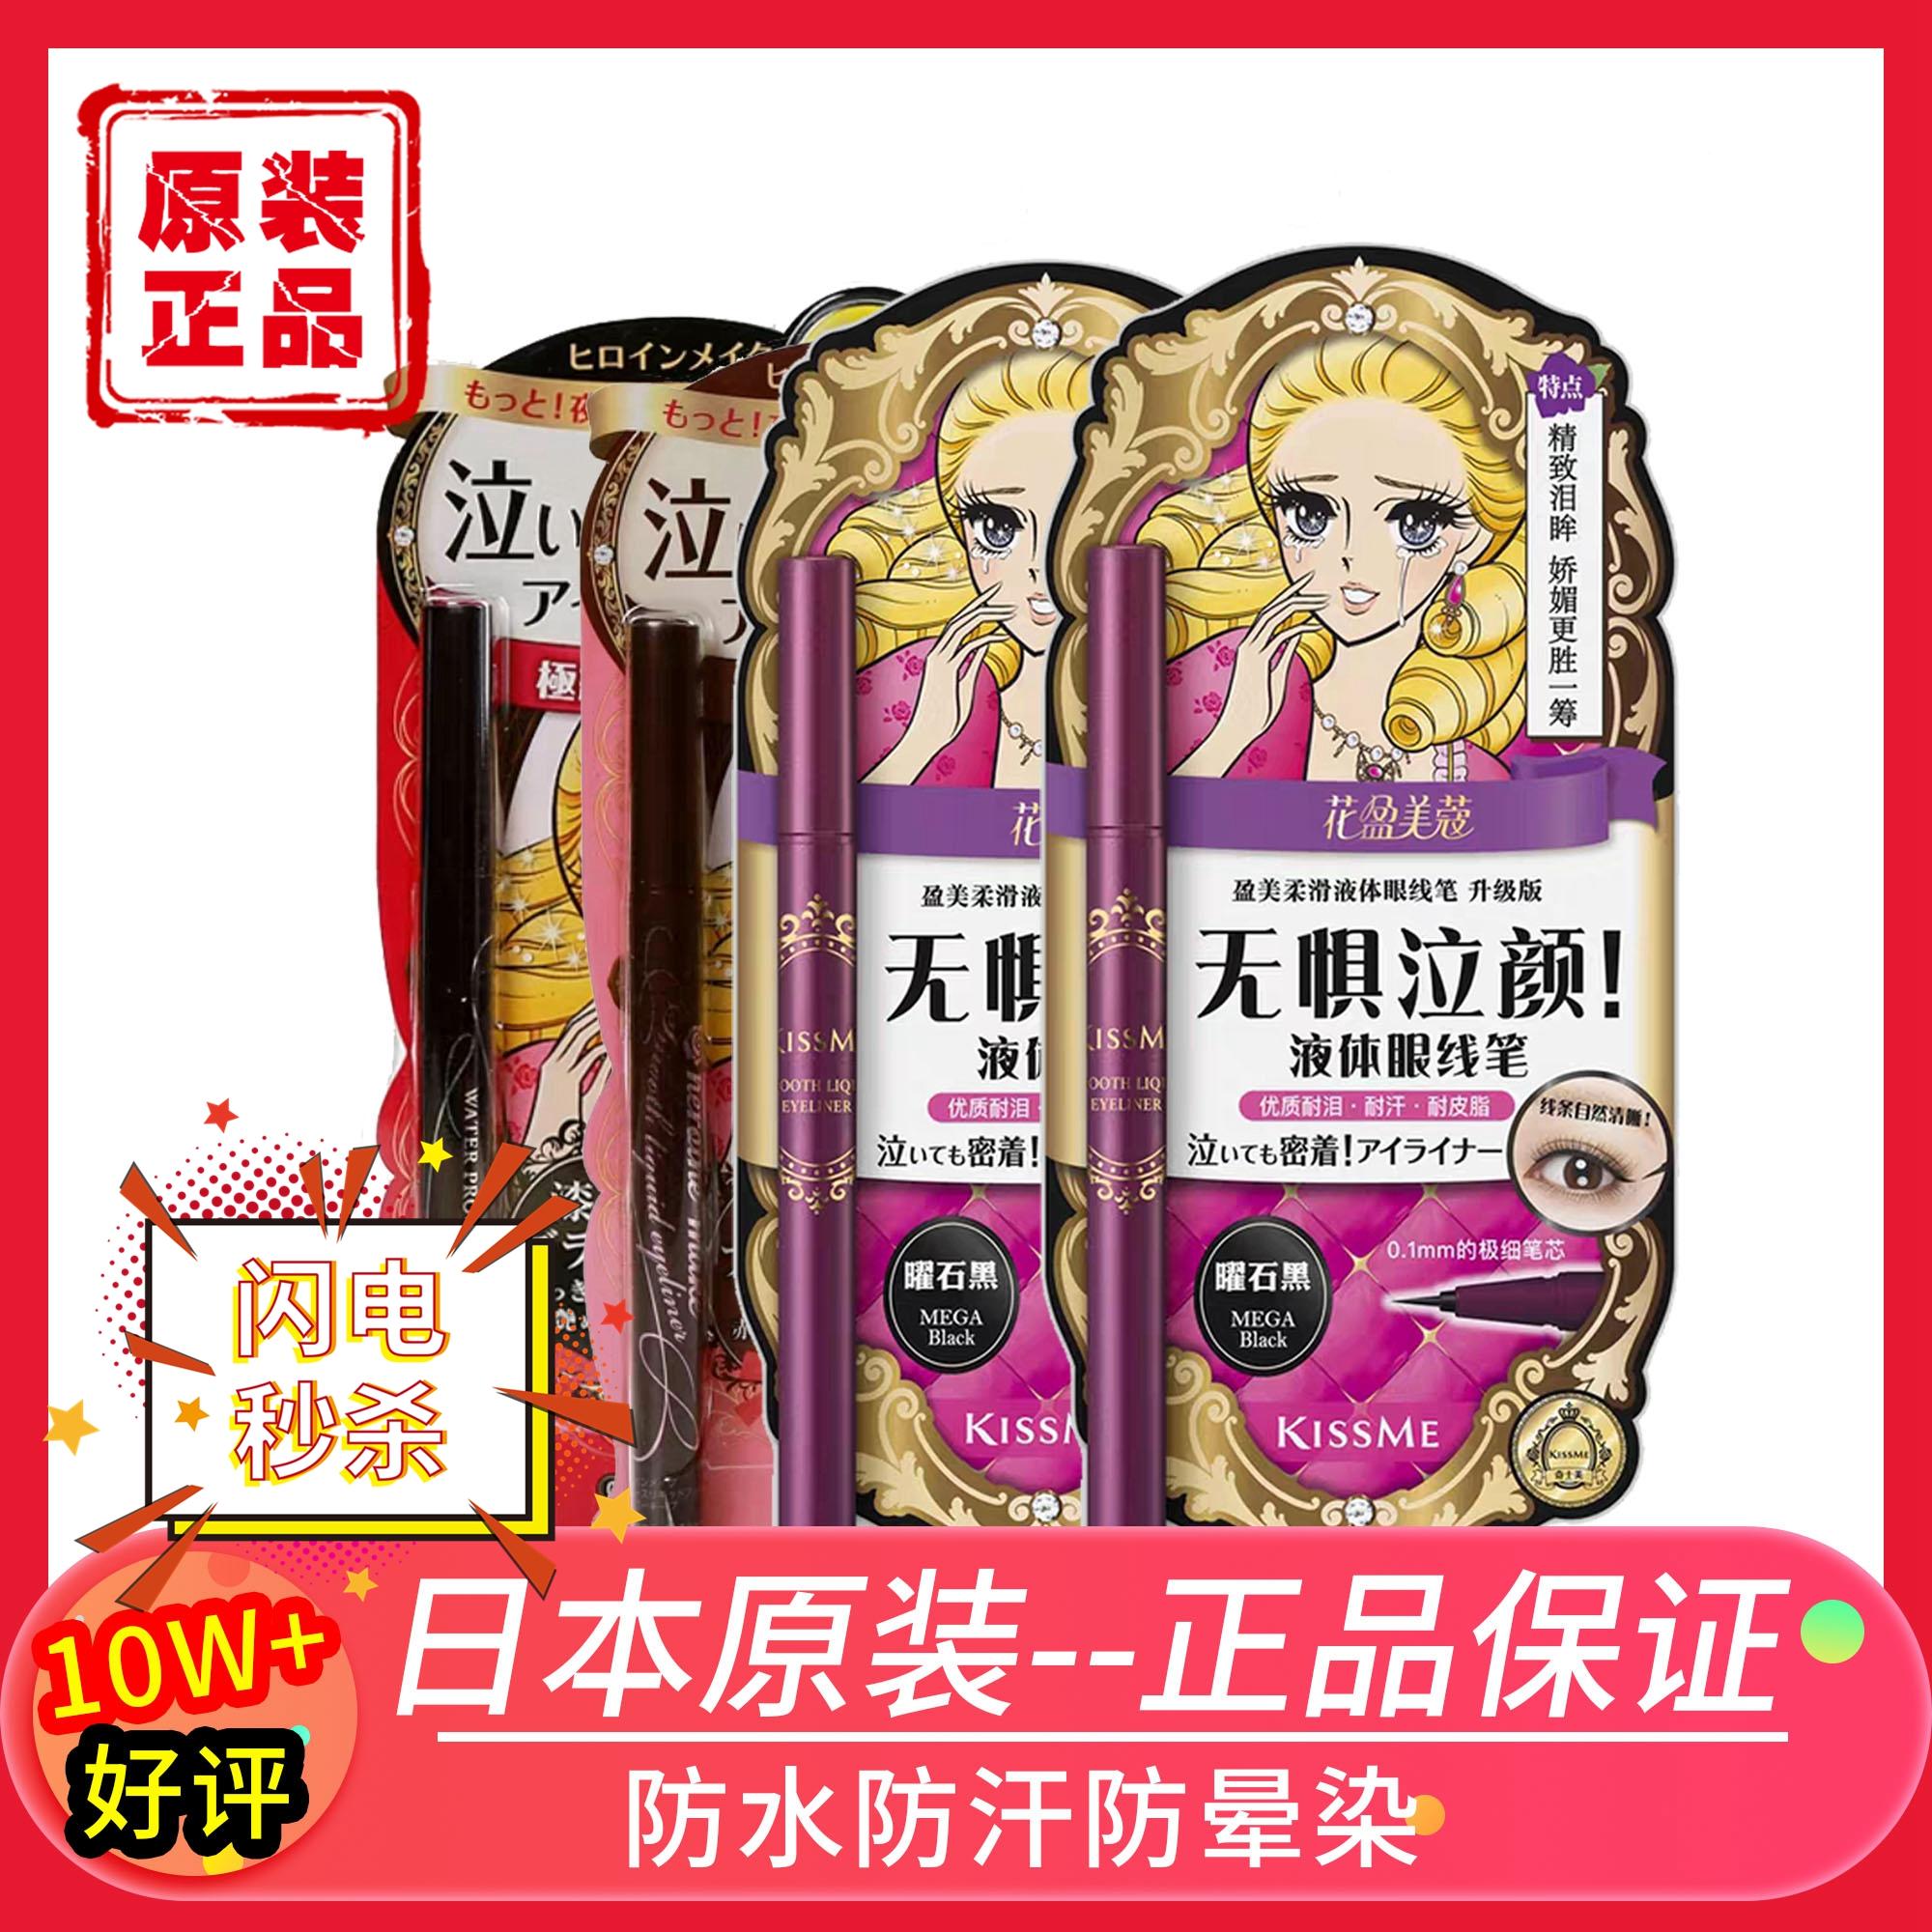 On sale, Japanese kissme Eyeliner Pen, female kiss me, waterproof not faint, lasting kiss?